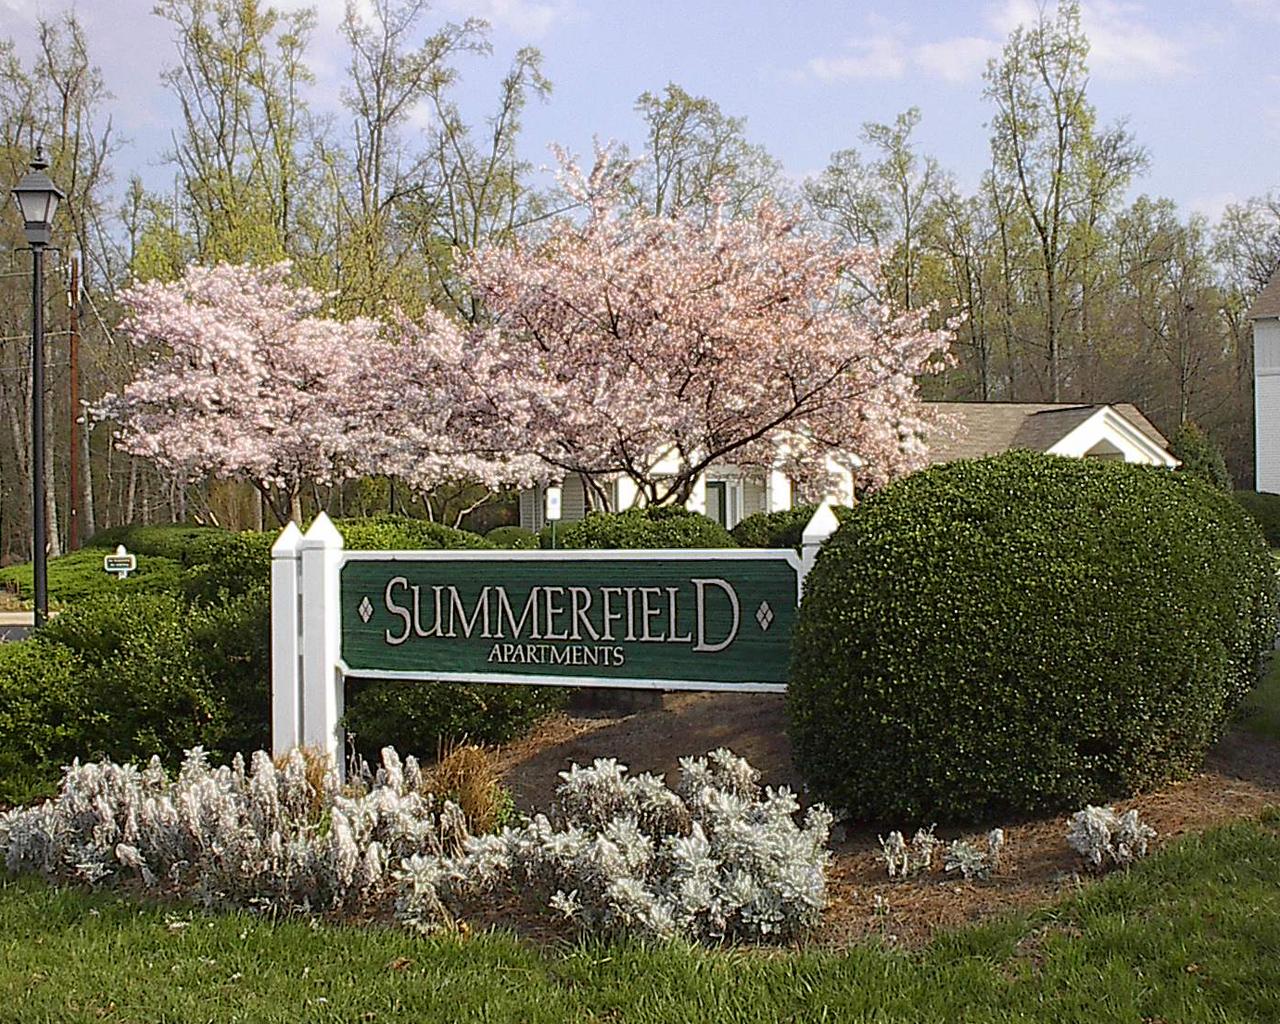 Summerfield Apartments Exterior